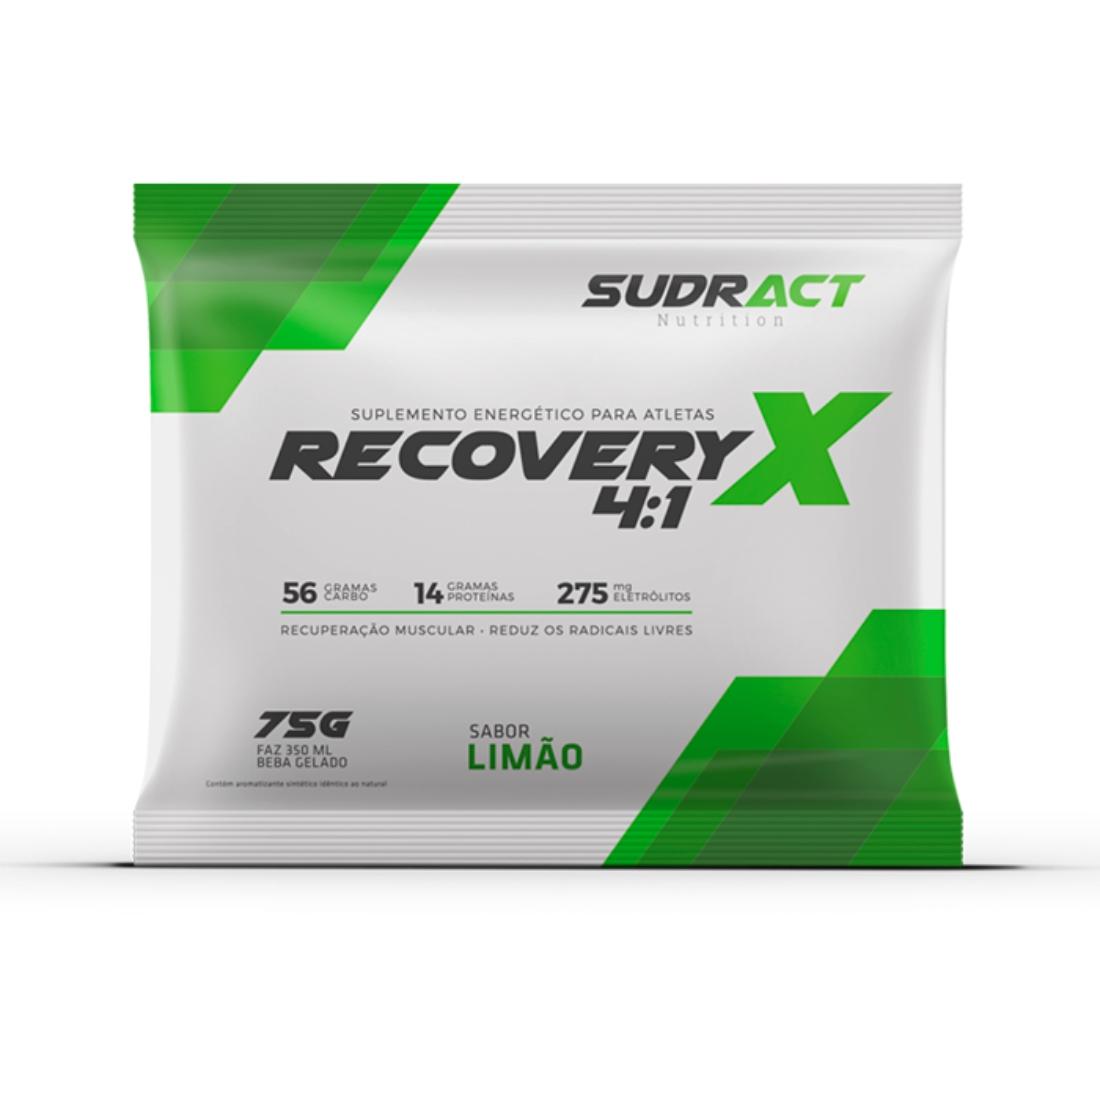 Suplemento Energético Sudract Recovery X 4:1 75g - C/10 UN